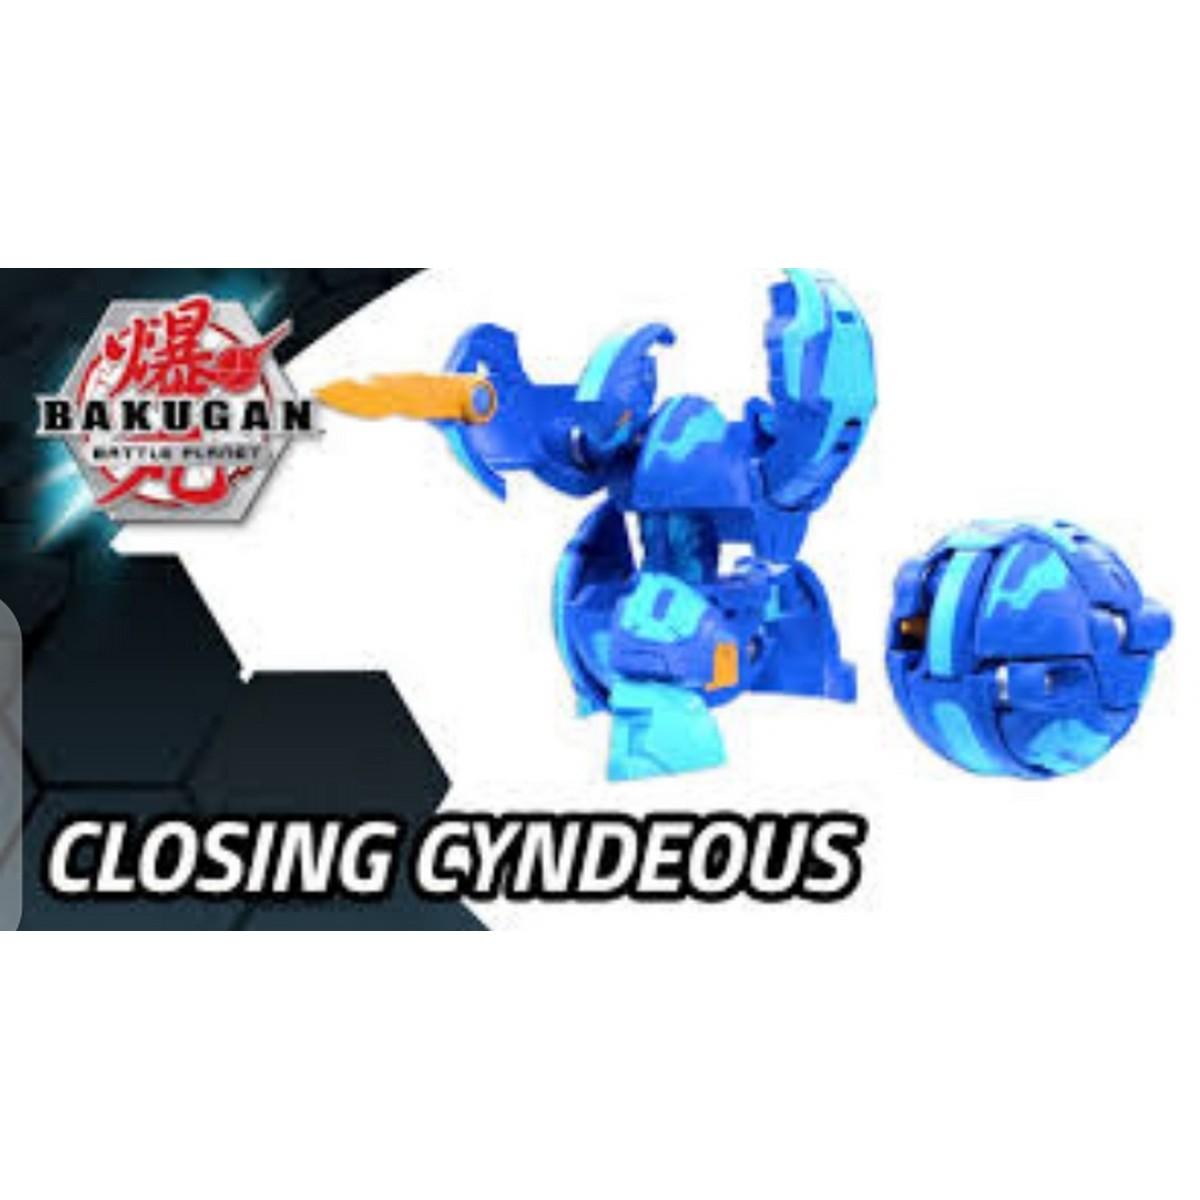 Bakugan Toy Deformation Ball quick transform dragonite infinity Collection